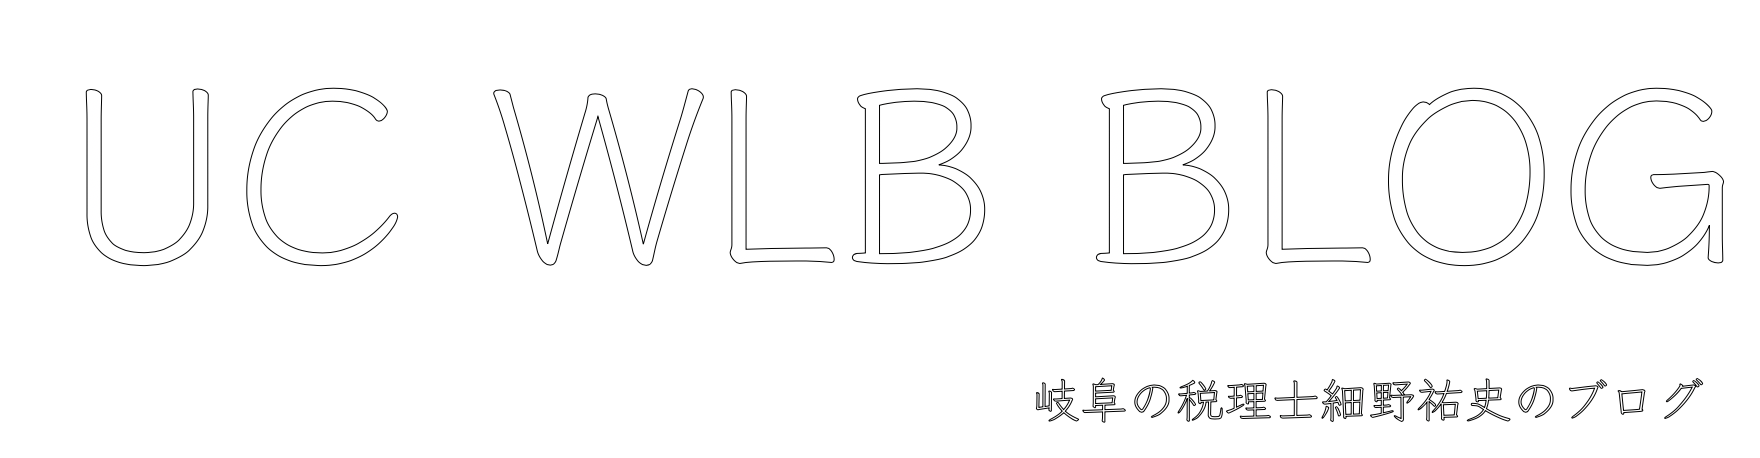 UC WLB BLOG